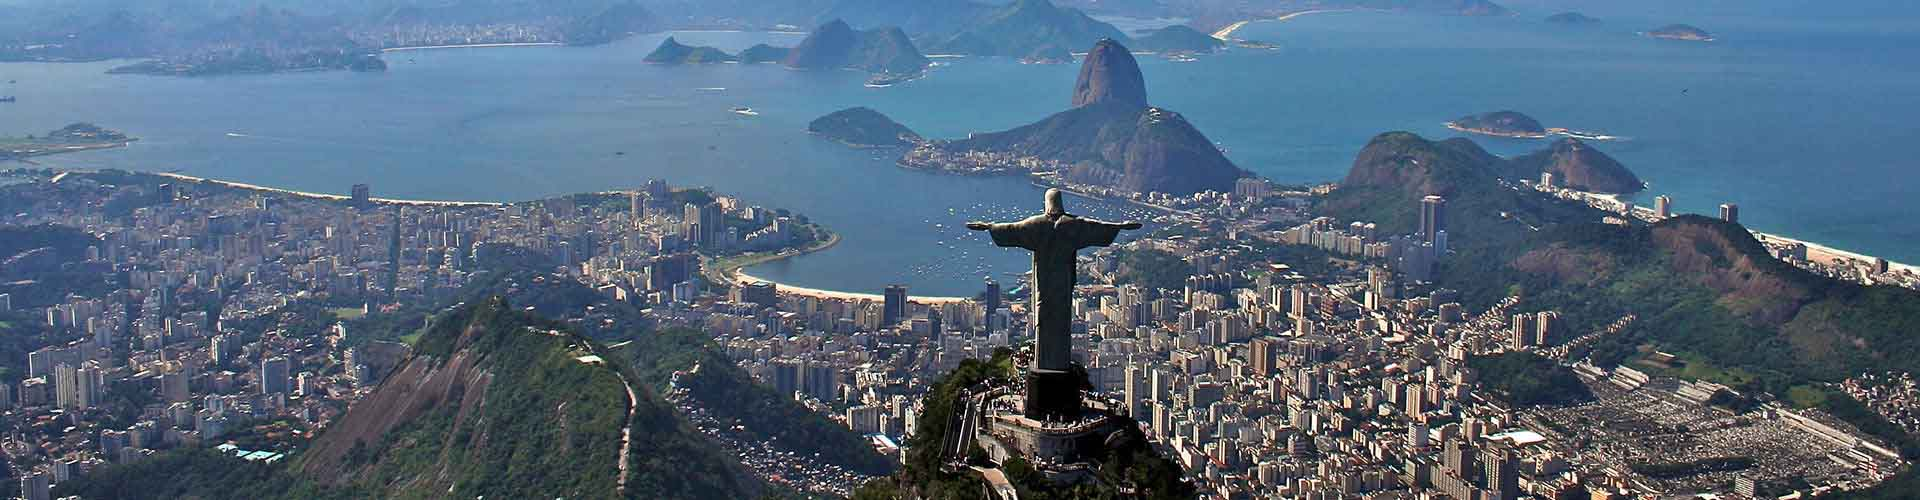 Rio de Janeiro - Chambres pas chères dans le quartier de Favela Do Vidigal. Cartes pour Rio de Janeiro, photos et commentaires pour chaque chambre à Rio de Janeiro.